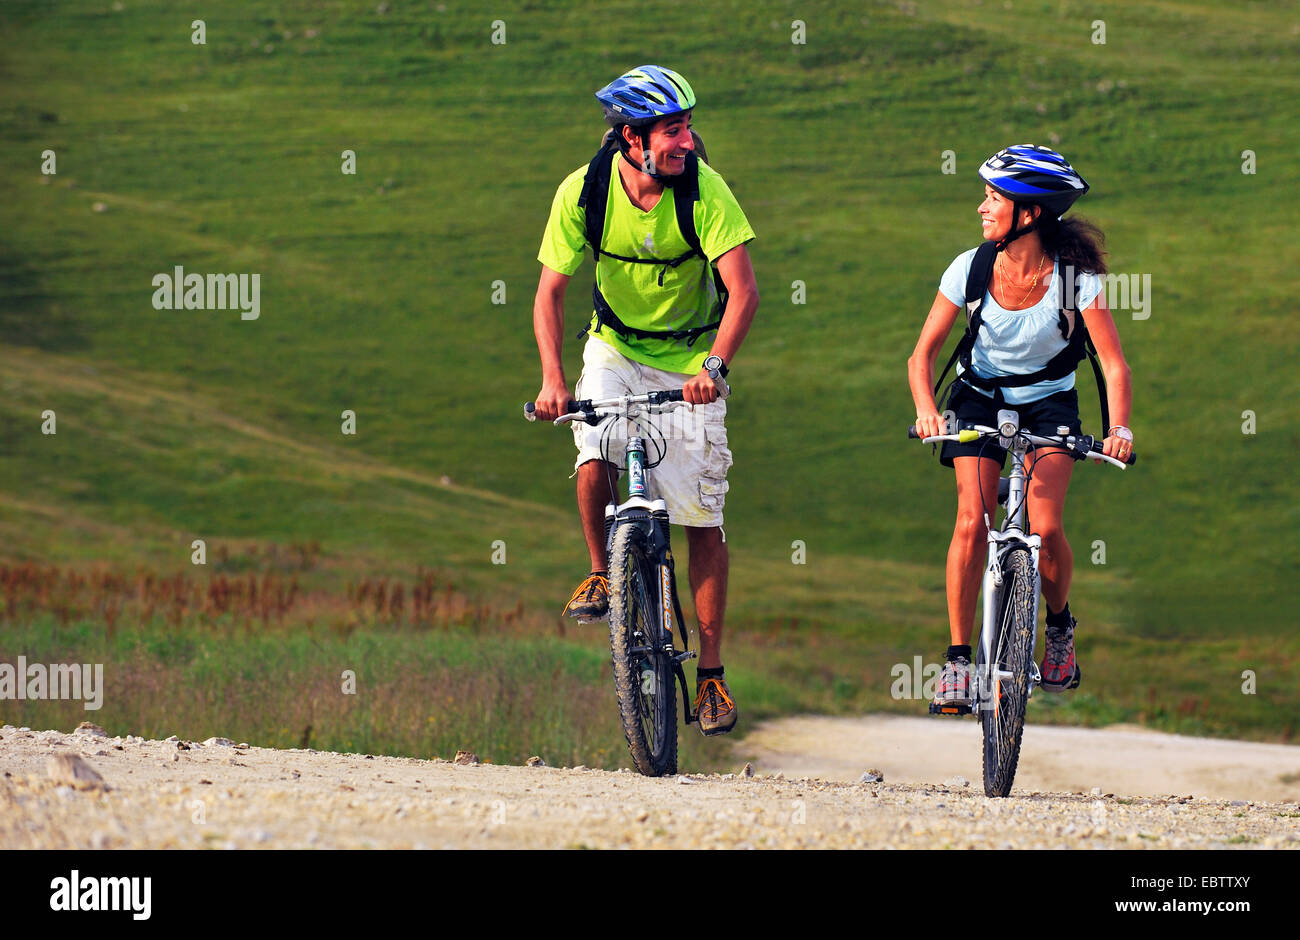 two mountain bikers riding on mountain trail, France, Savoie, Vanoise National Park, La Plagne - Stock Image